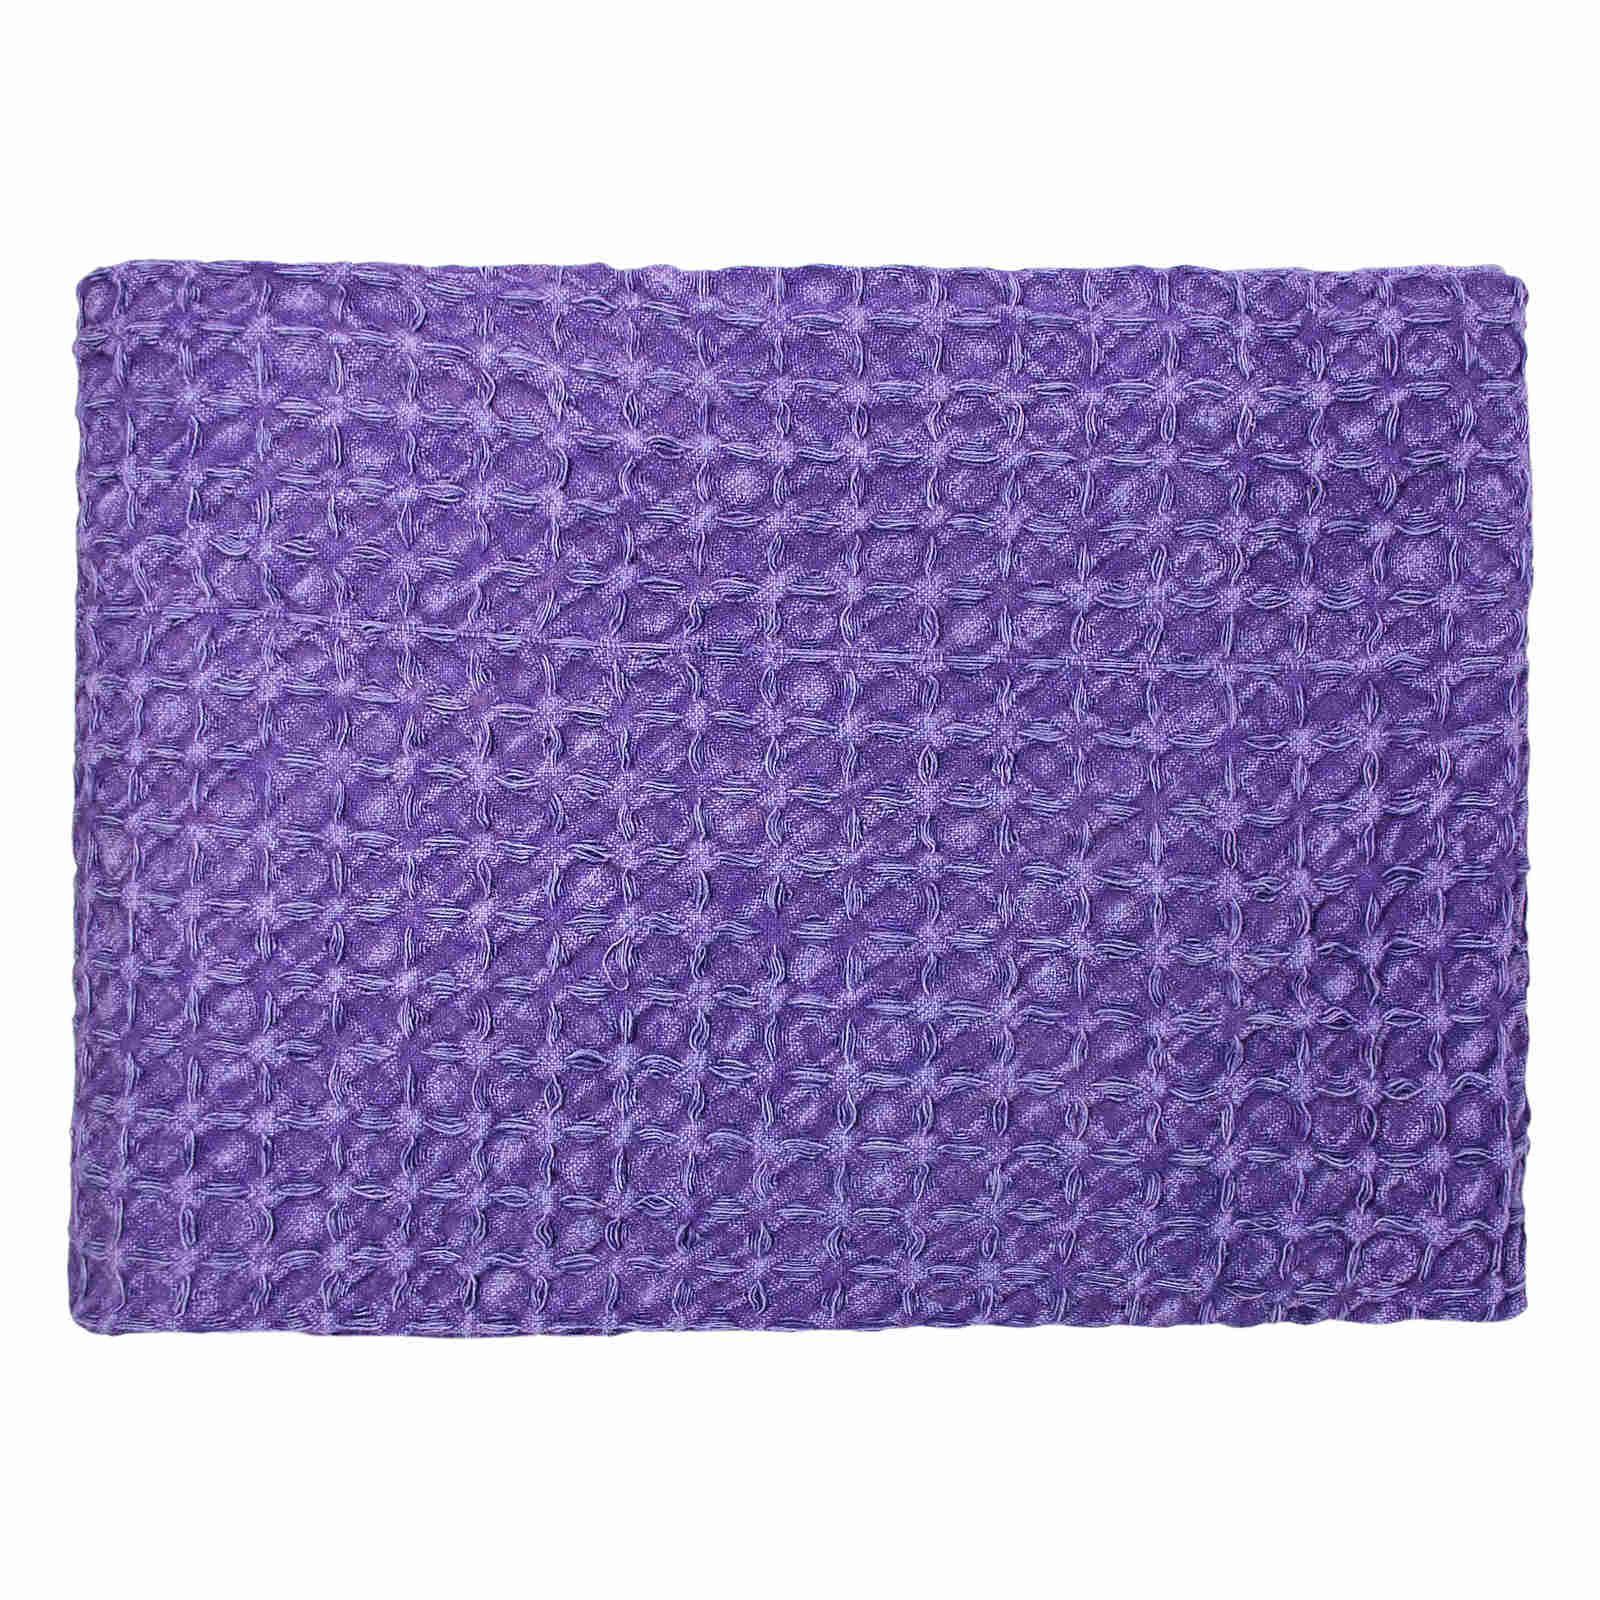 Oregon-Stonewash-Waffle-Throw-Modern-Distressed-Sofa-Bed-Blankets-100-Cotton thumbnail 25